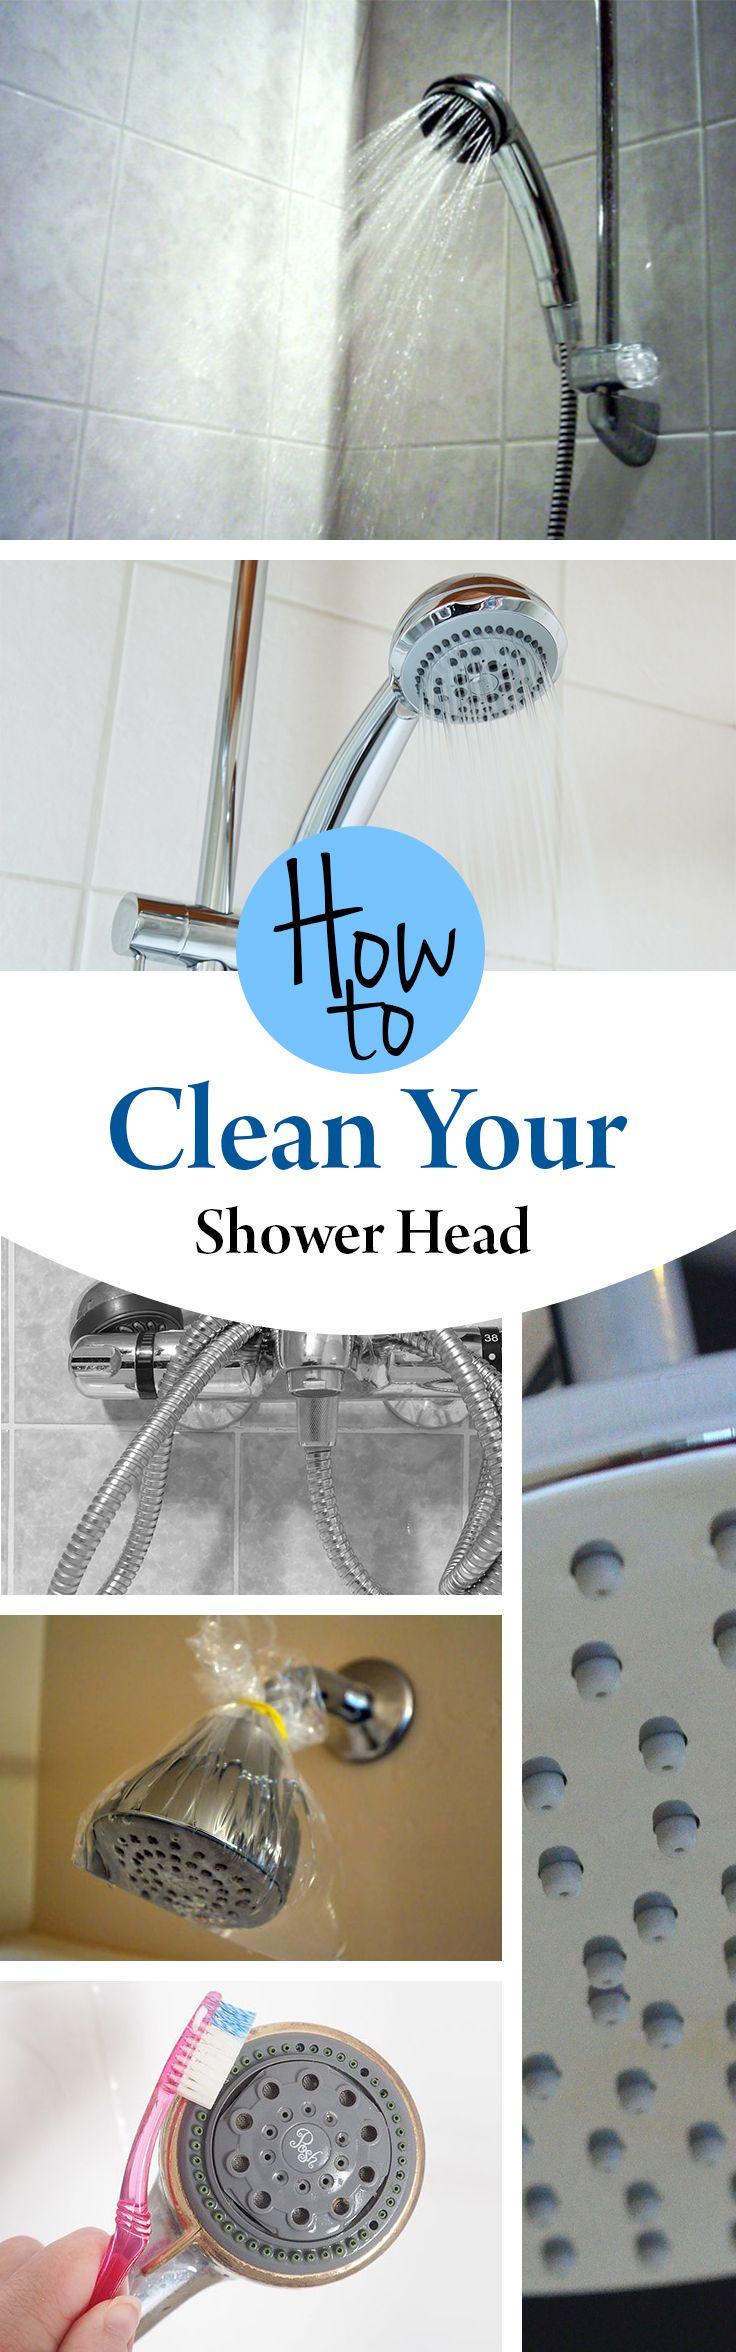 Best 25 Shower Head Cleaning Ideas On Pinterest Shower Cleaning Shower Cleaner And Cleaning